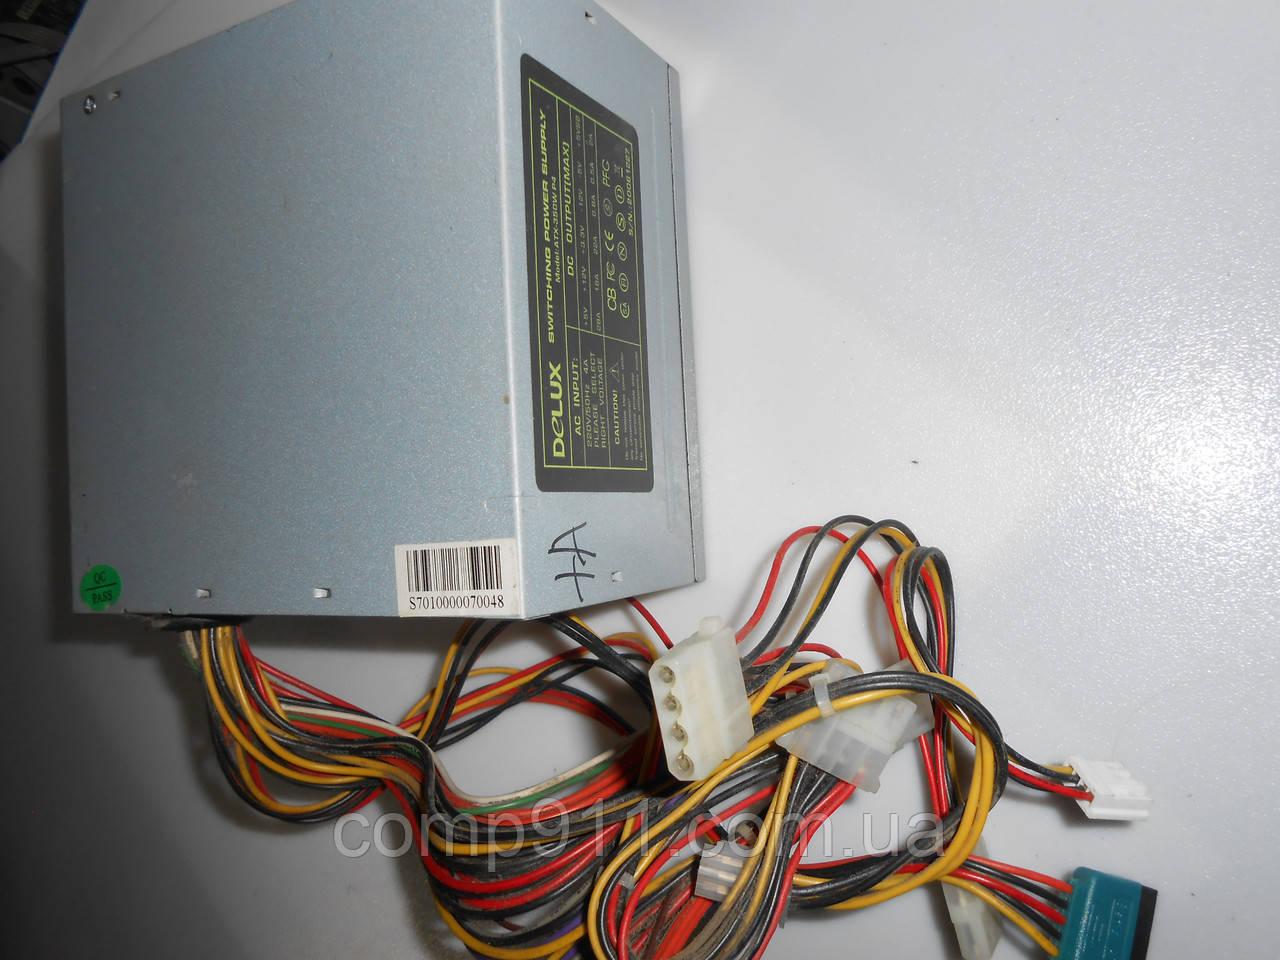 Блок питания Delux  Atx-350w P4 350w